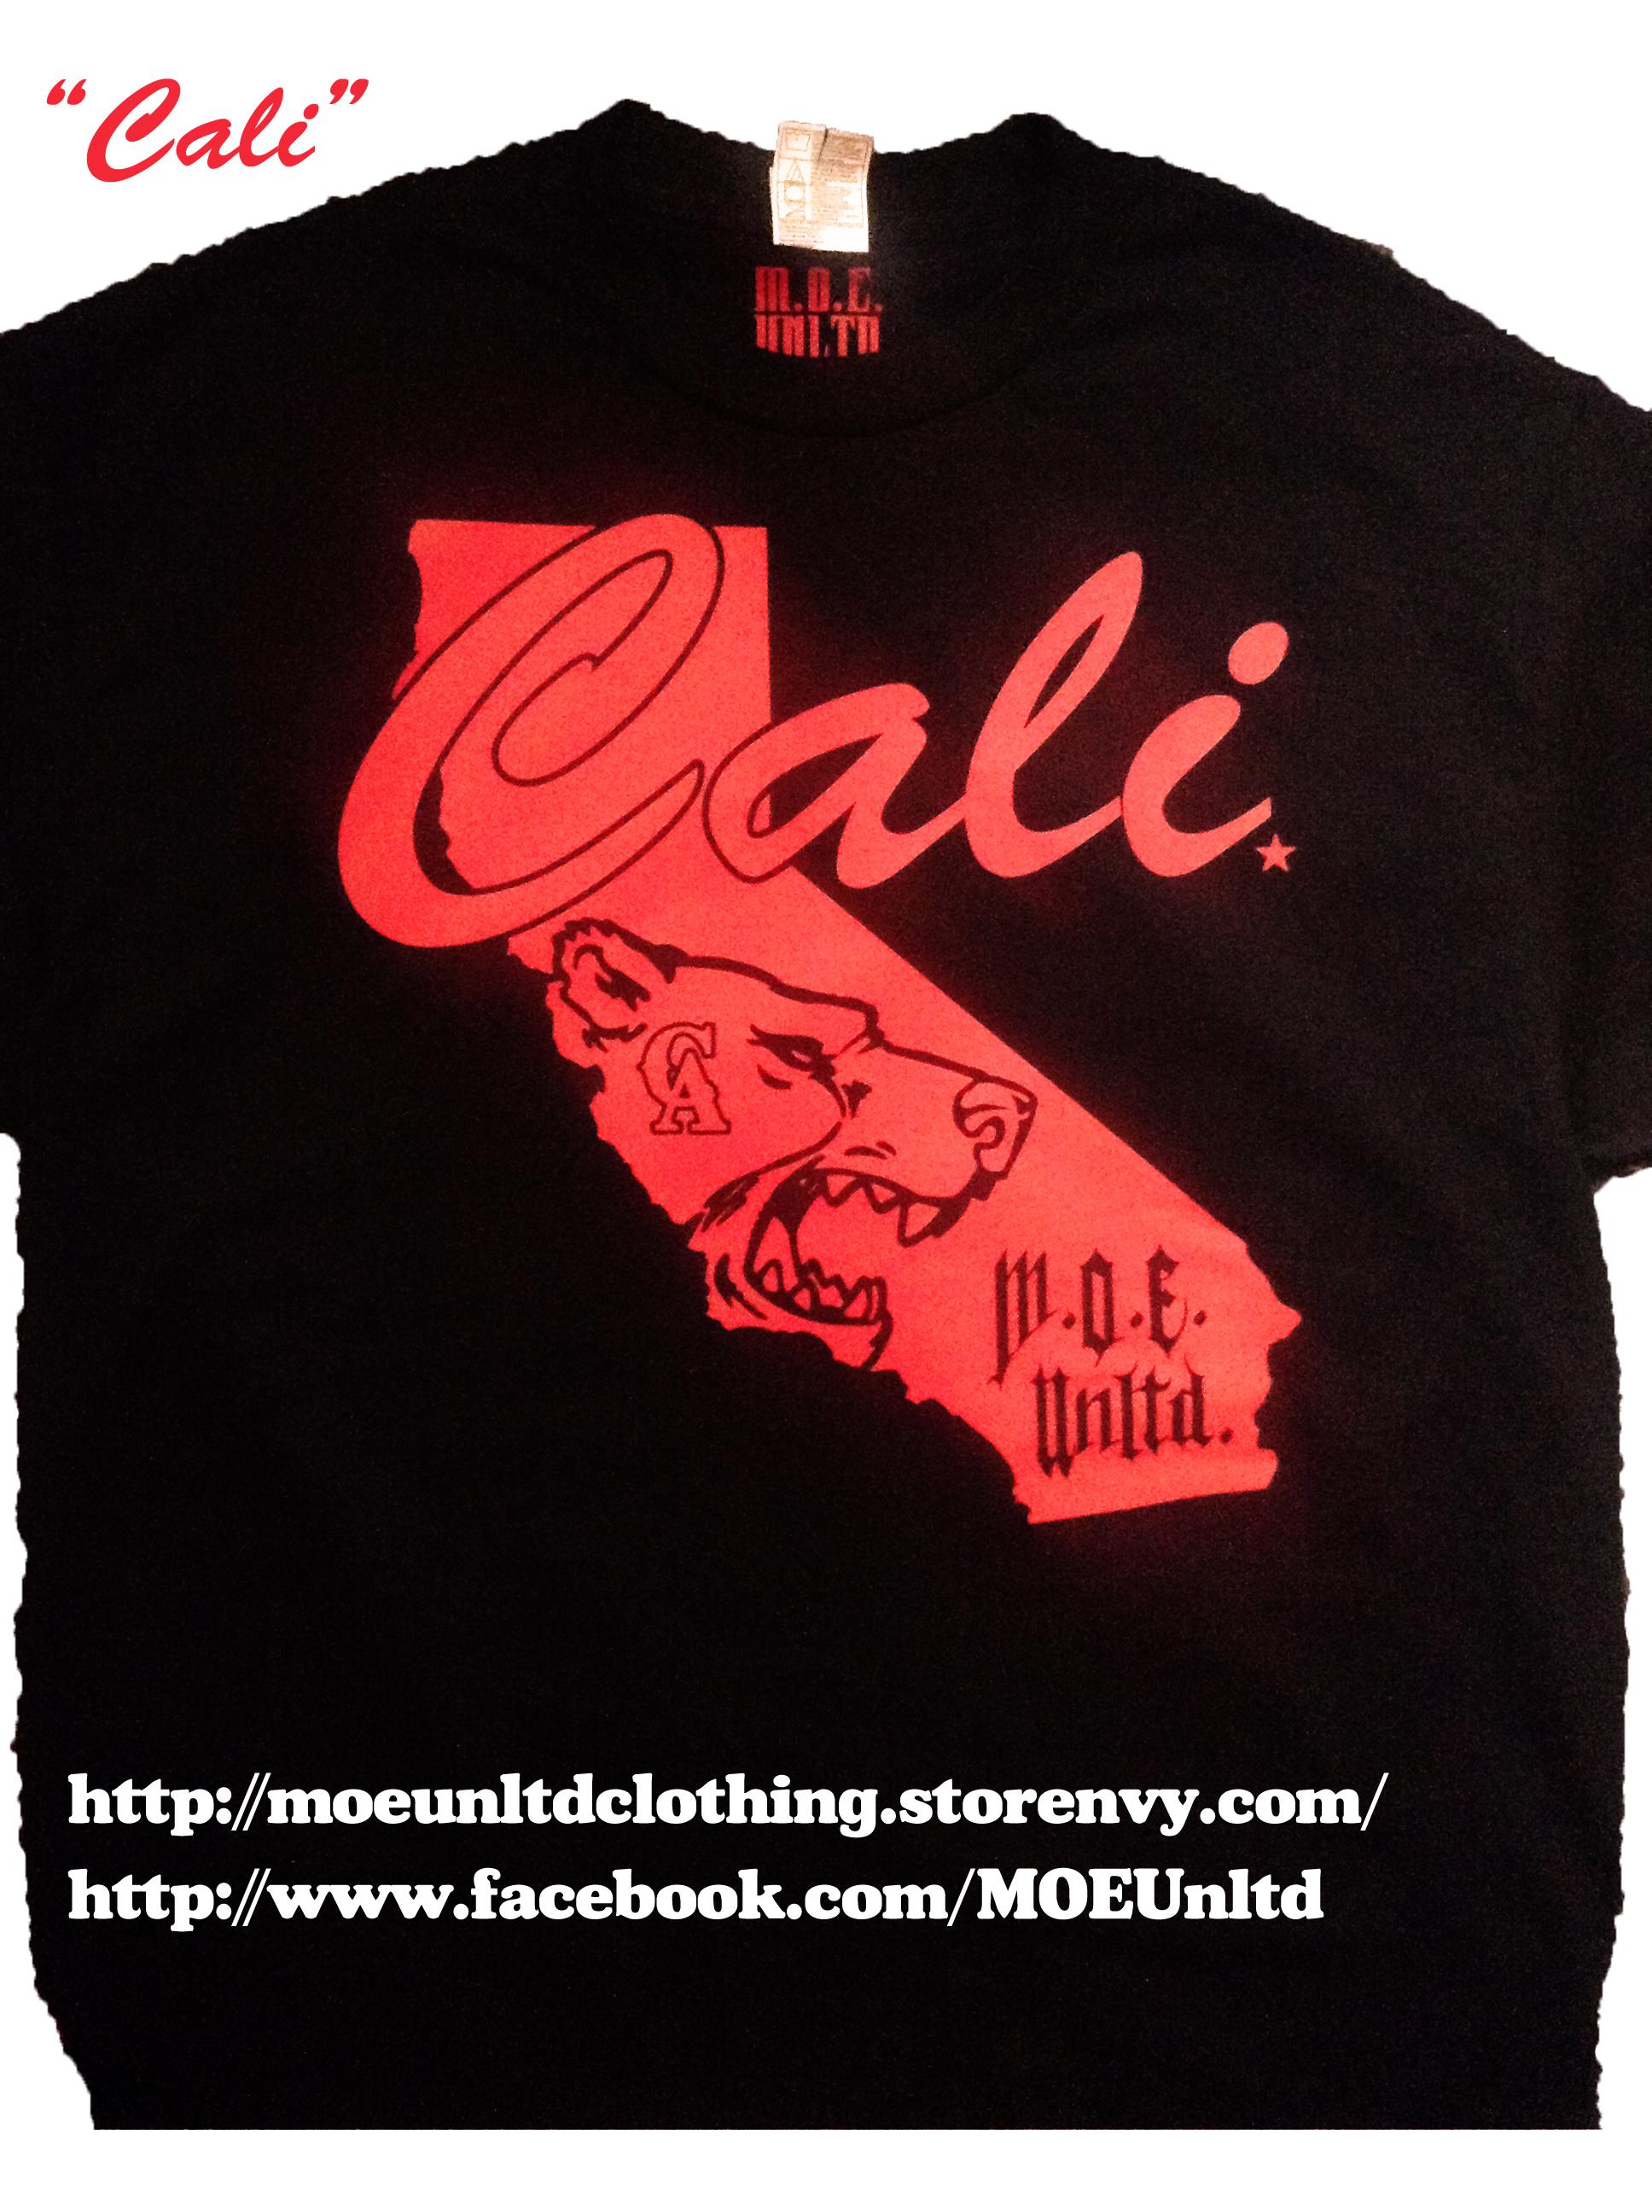 M.o.e. Unltd. Clothing   Cali Men's Black/red T-Shirt   Online Store - California Map Shirt